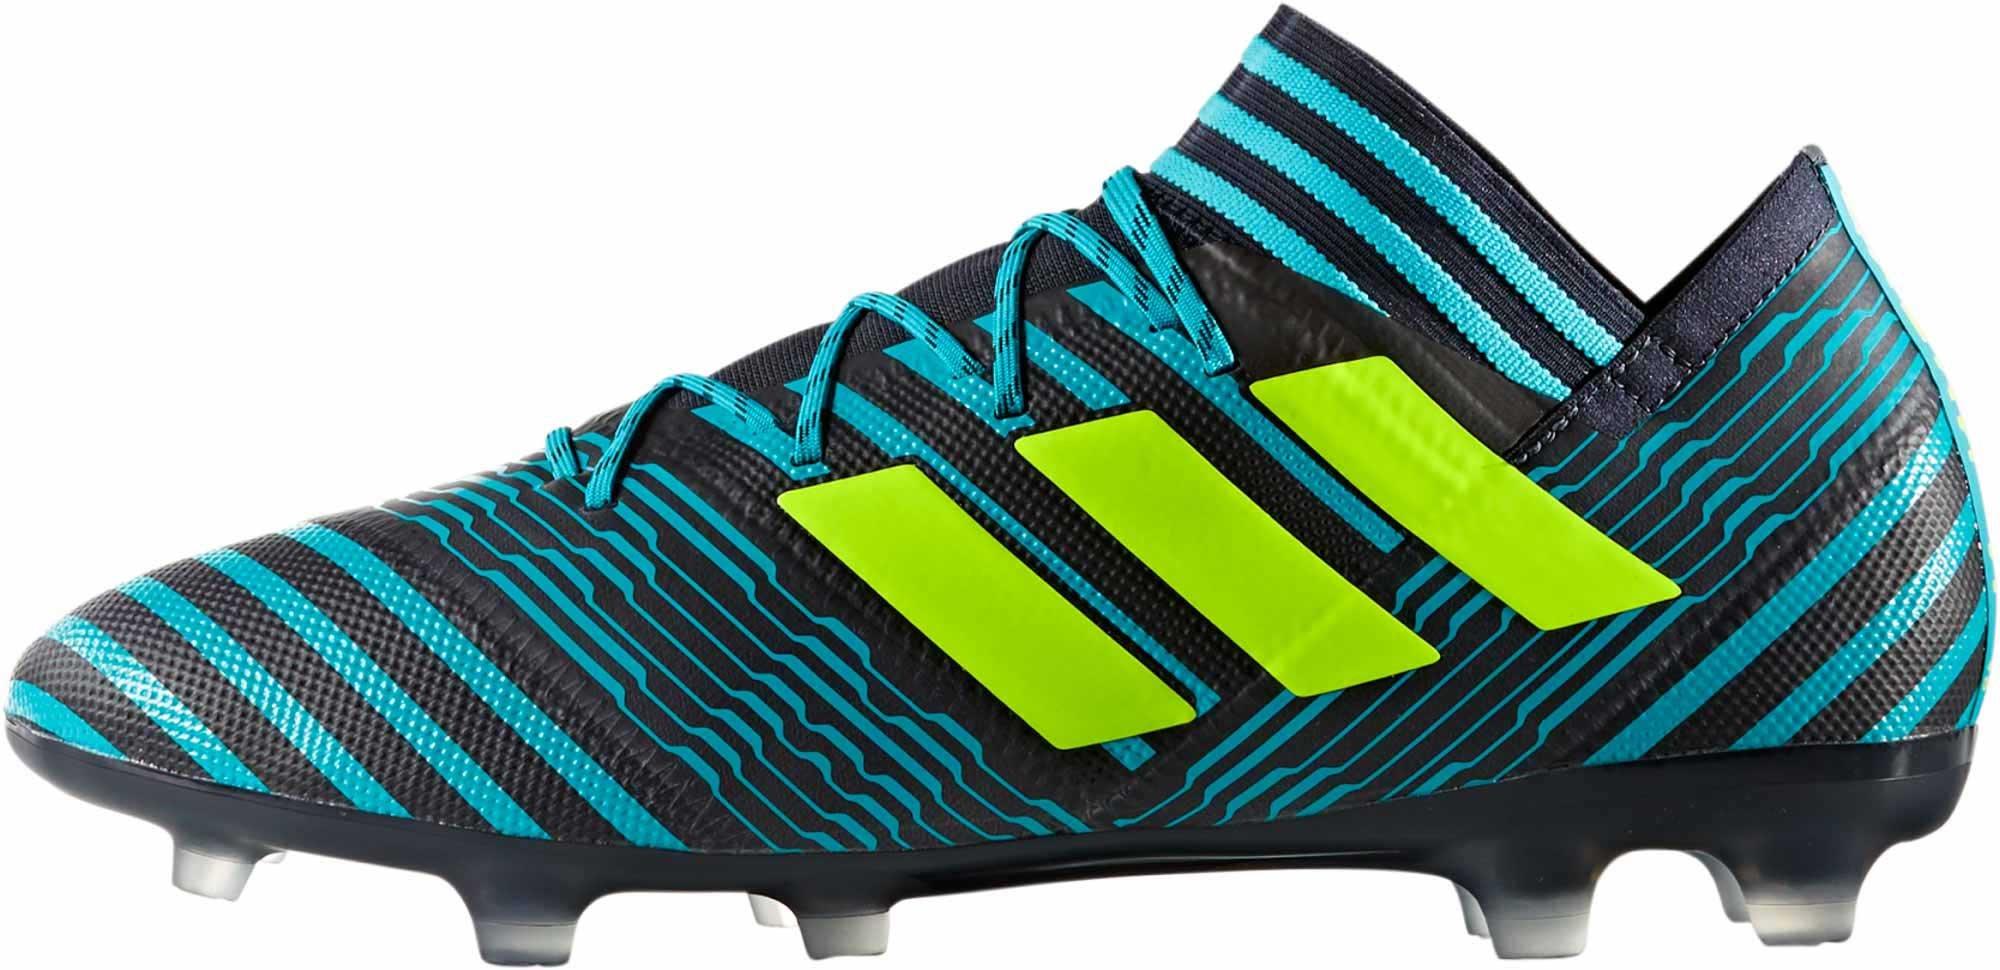 Football shoes adidas NEMEZIZ 17.2 FG